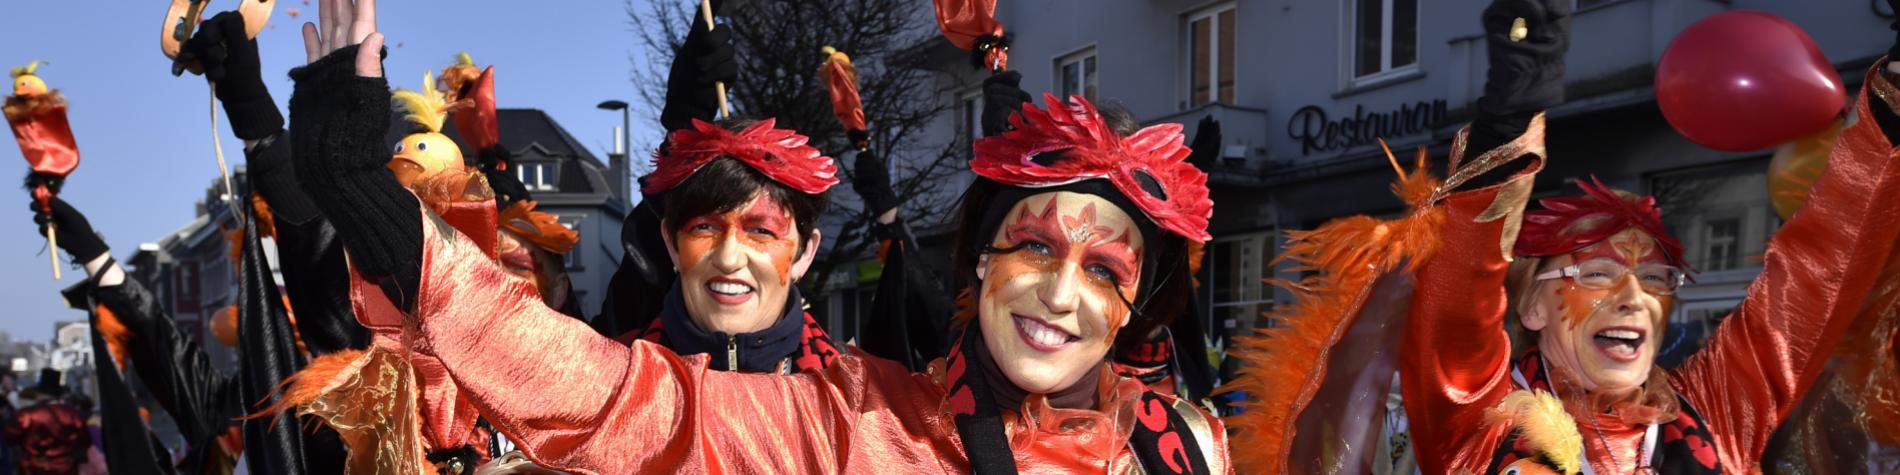 Carnaval d'Eupen, festivités du Lundi des Roses (Rosenmontag)